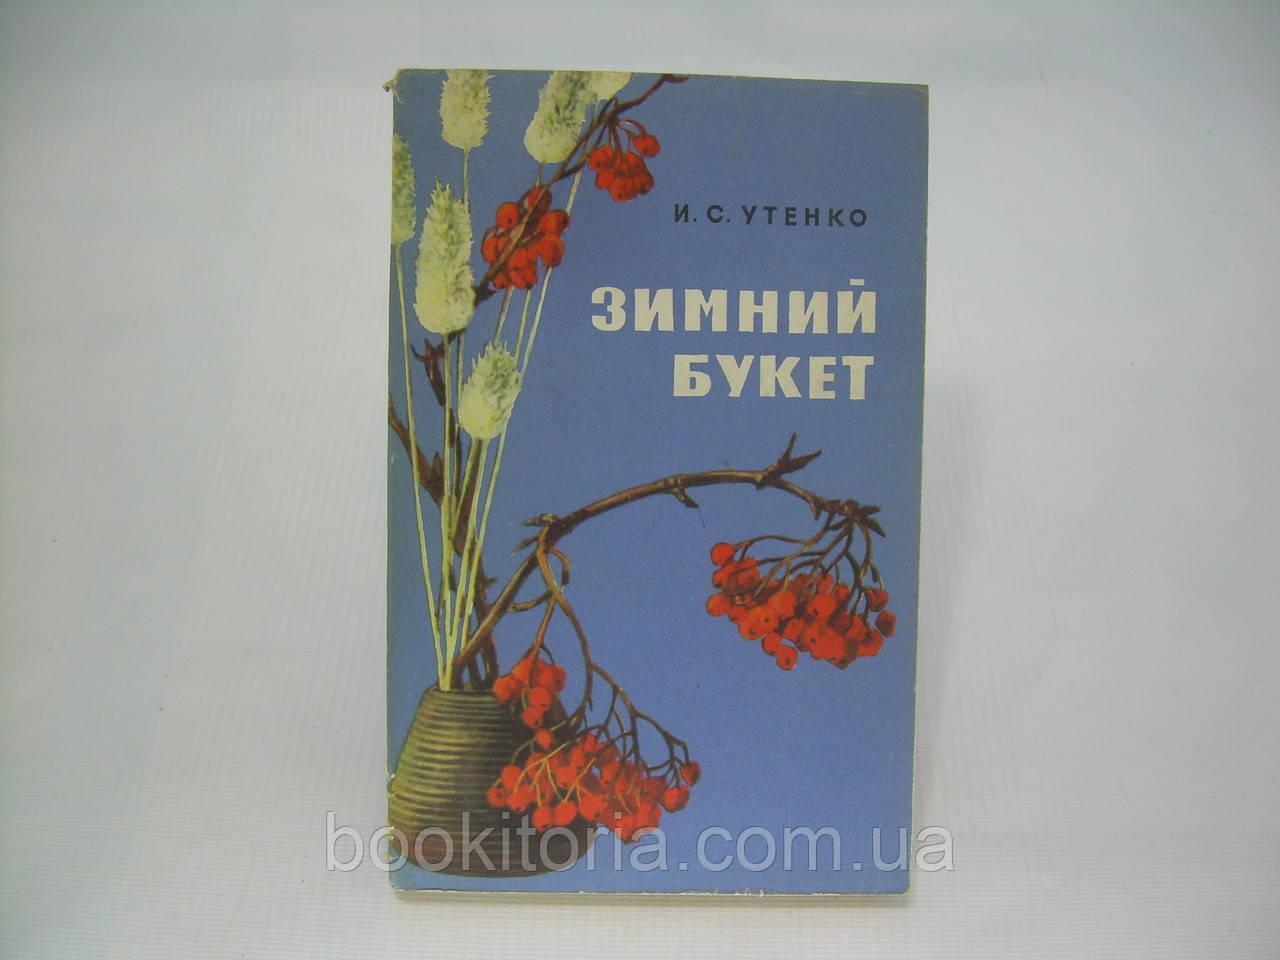 Утенко И.С. Зимний букет (б/у).